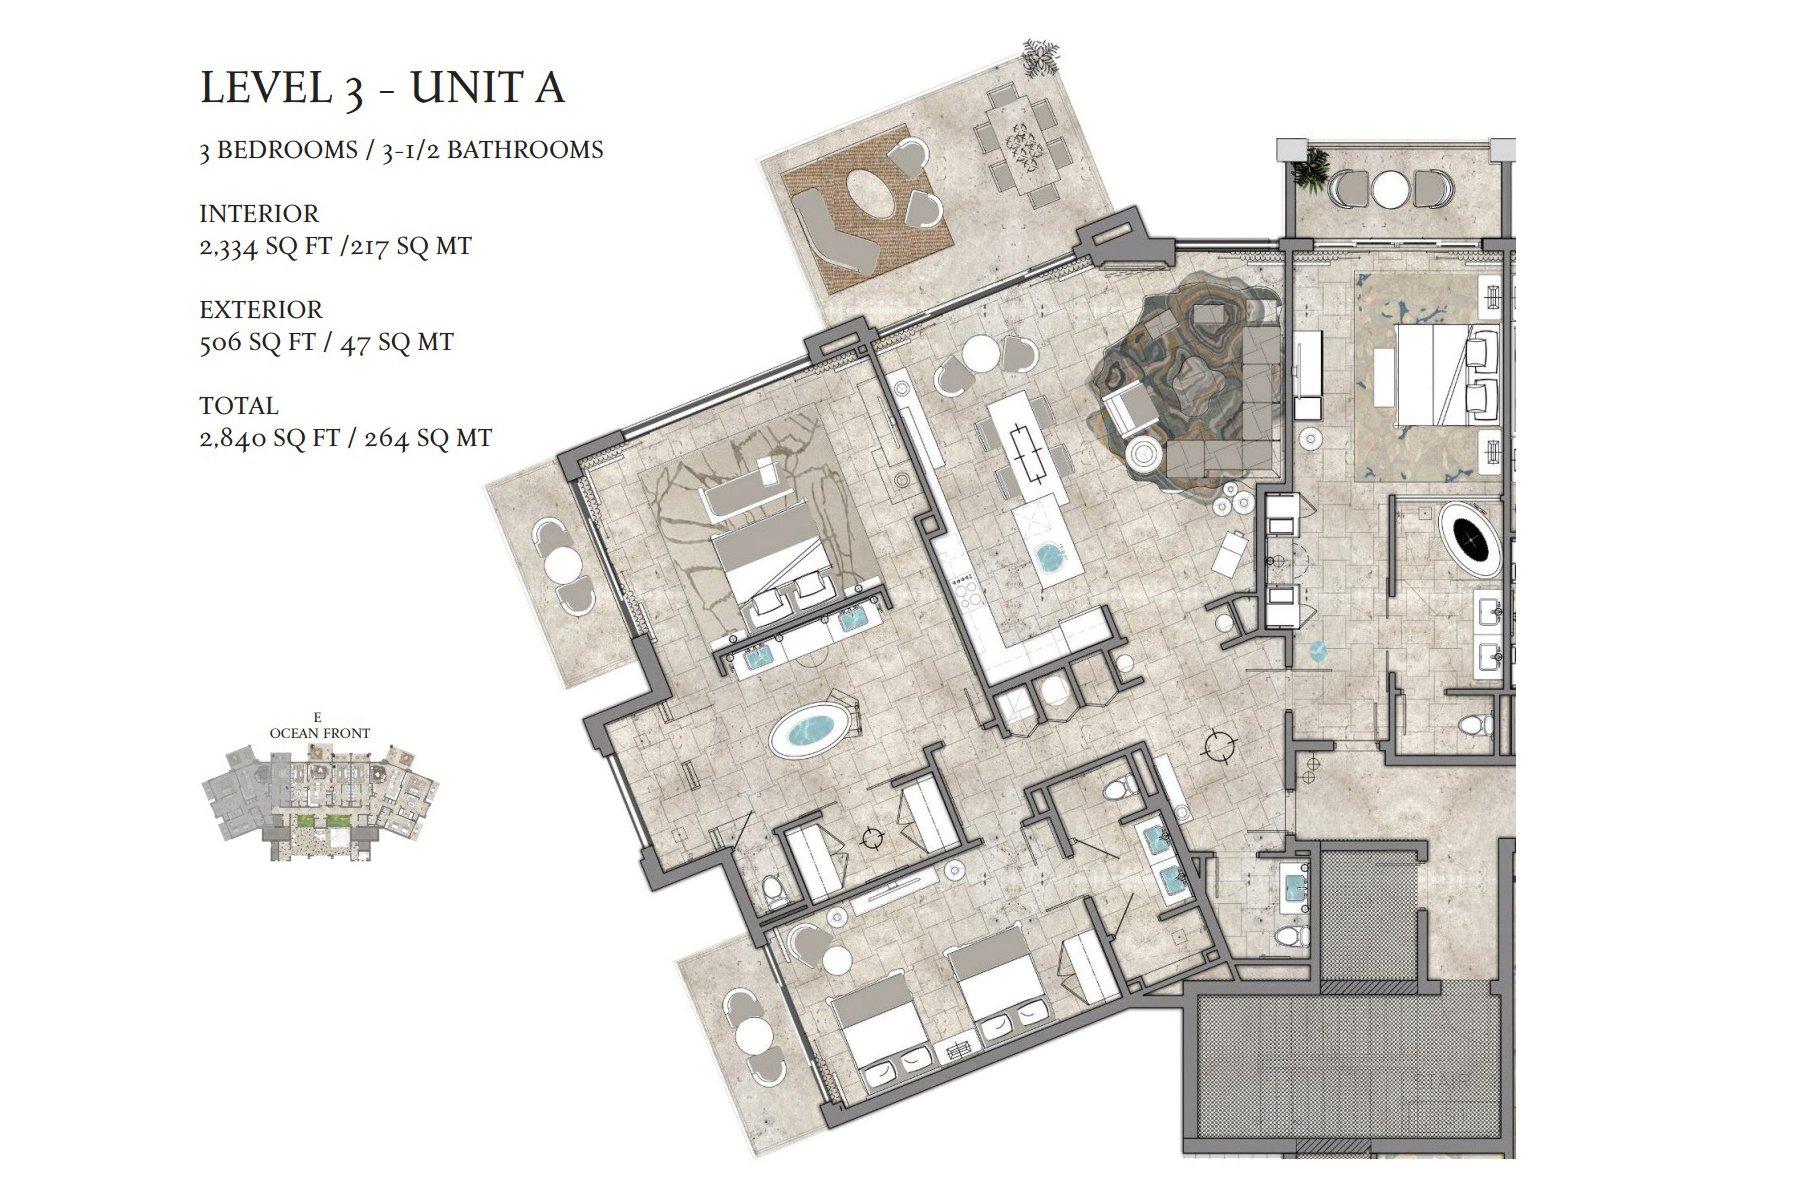 The Residences At St. Regis Bermuda Unit 1 C, 2 A, 2 C, In